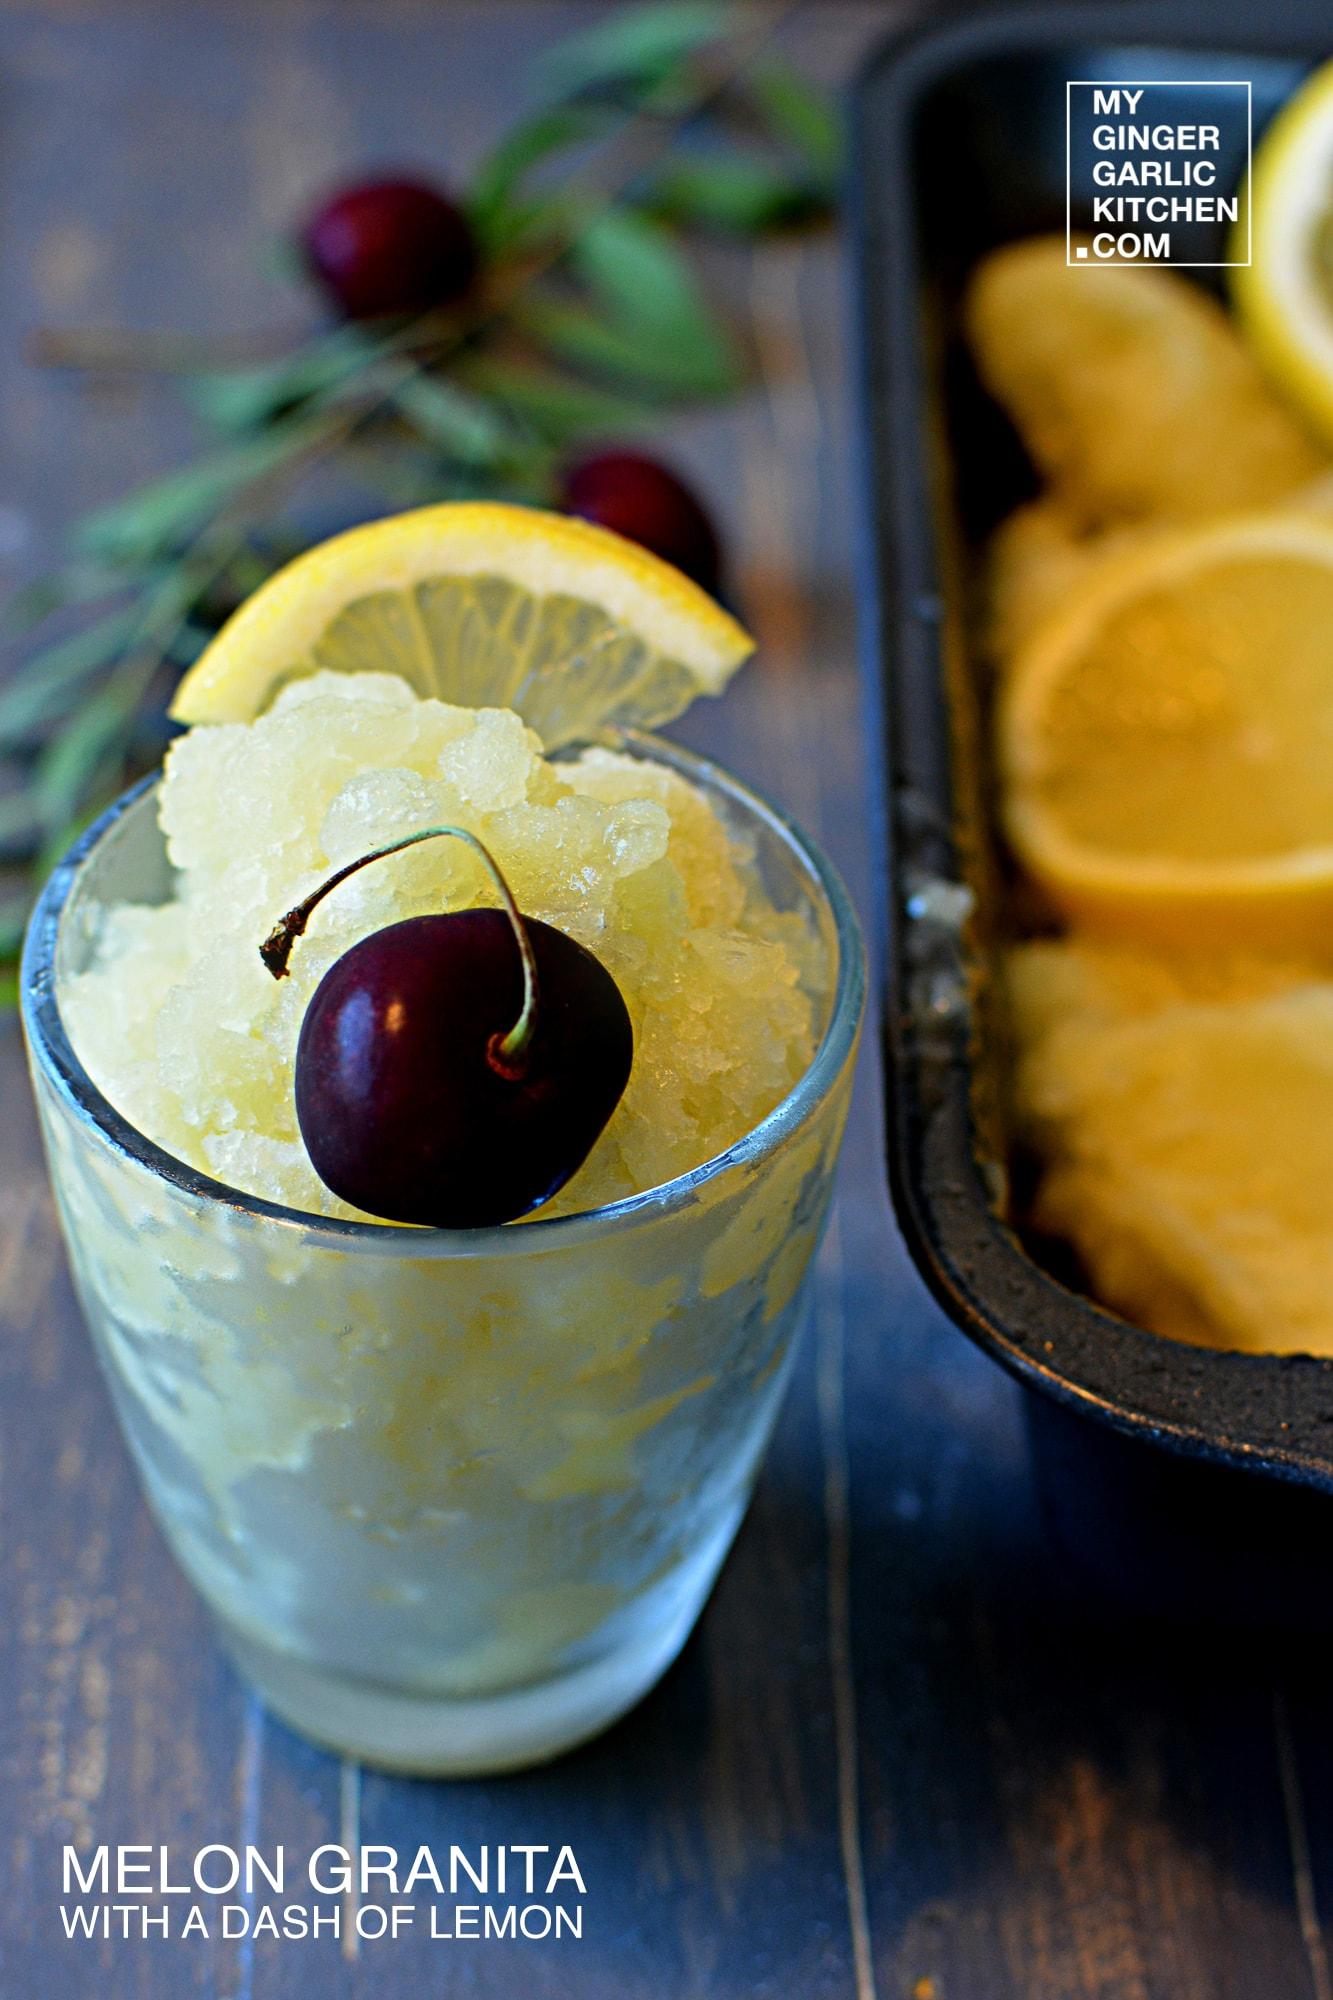 recipe-melon-granita-with-a dash-of-lemon-milk -anupama-paliwal-my-ginger-garlic-kitchen-1